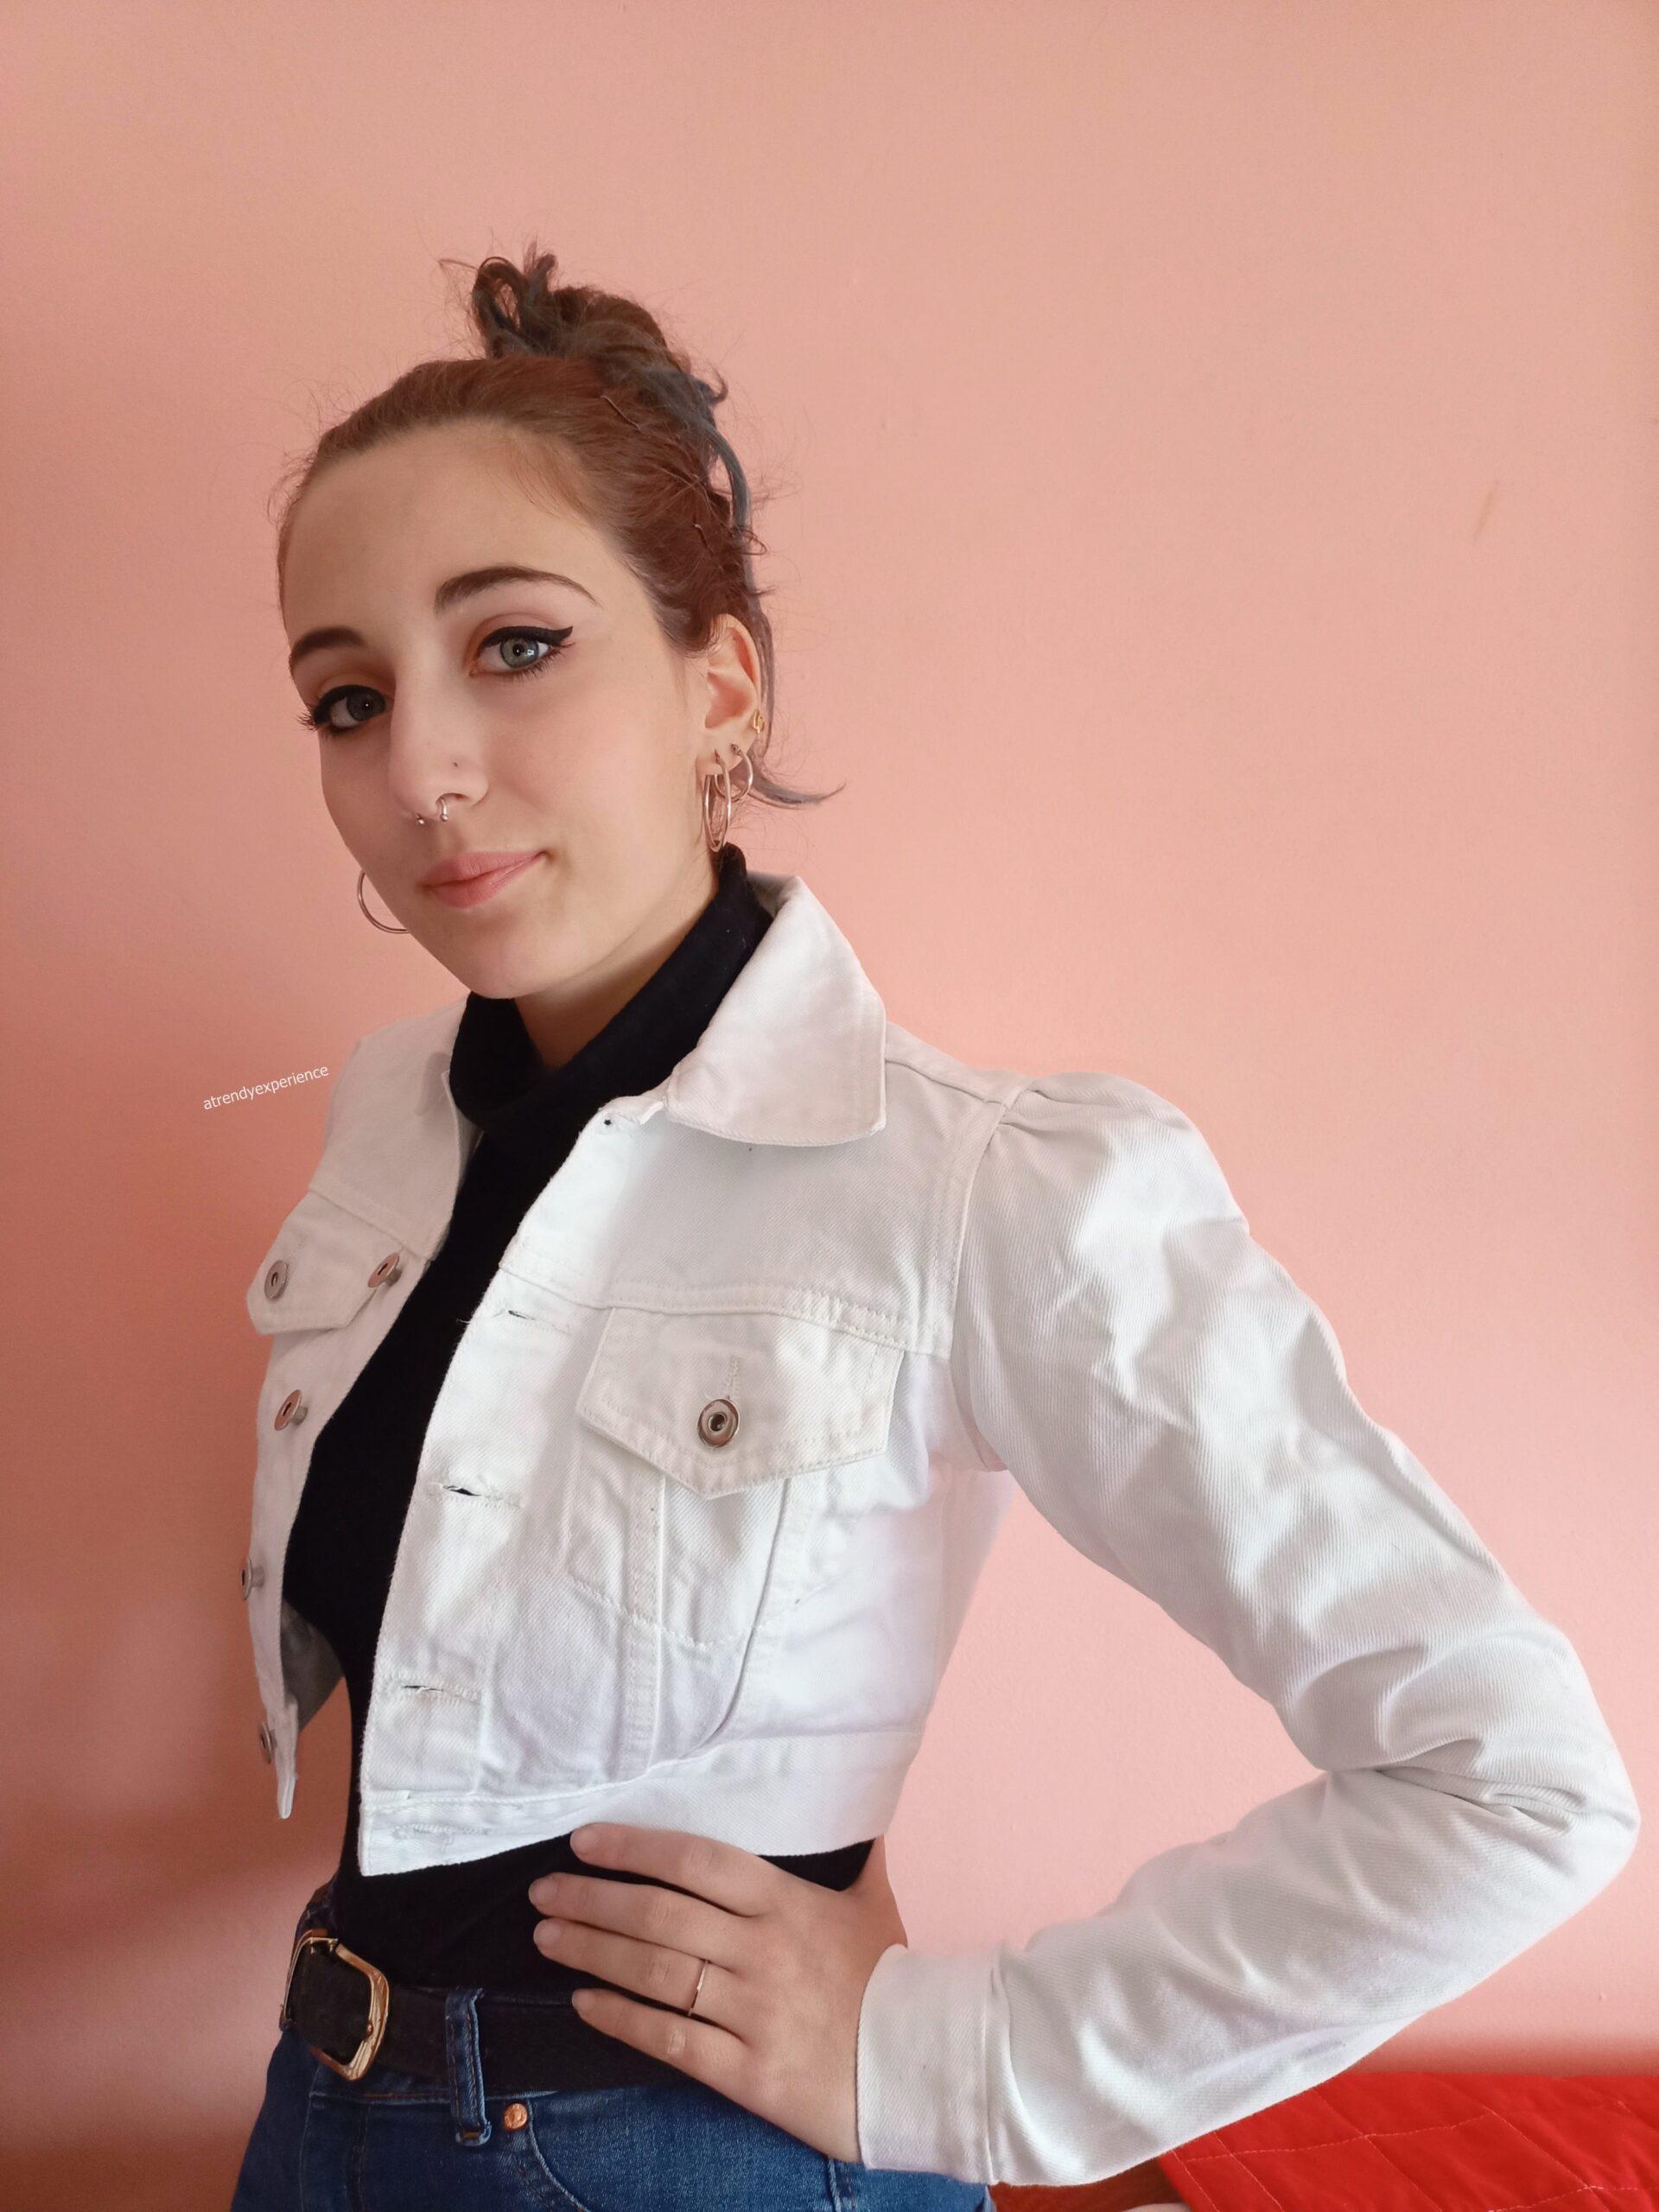 giacca denim bianca tendenza moda giacche primavera estate 2021